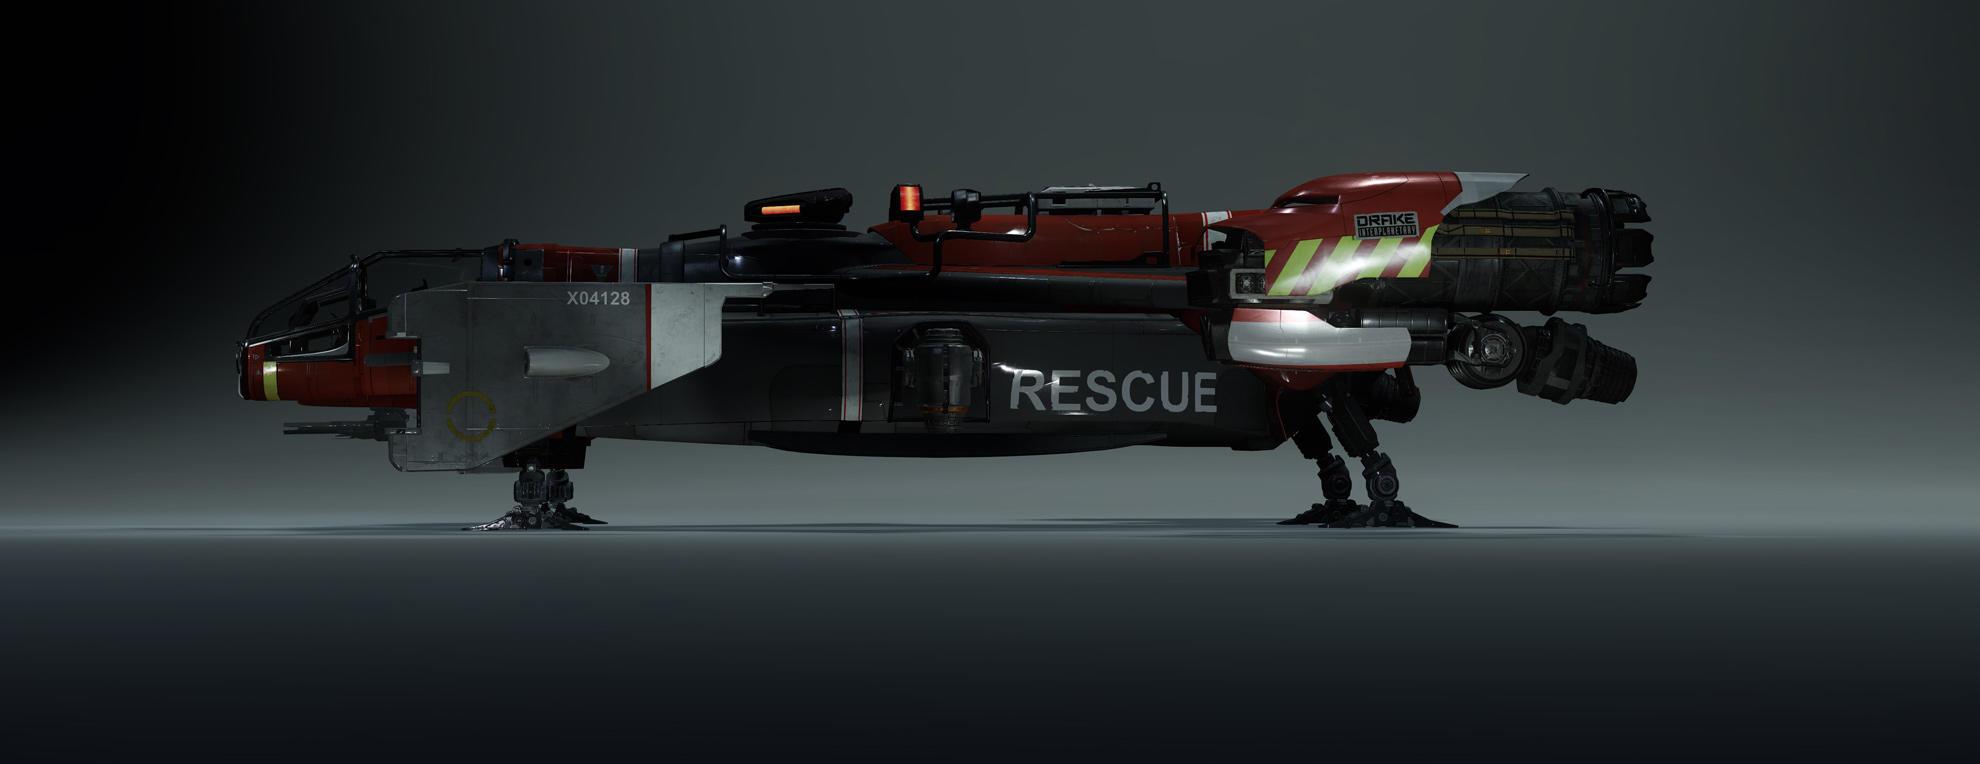 Cutlass Red - widok z boku